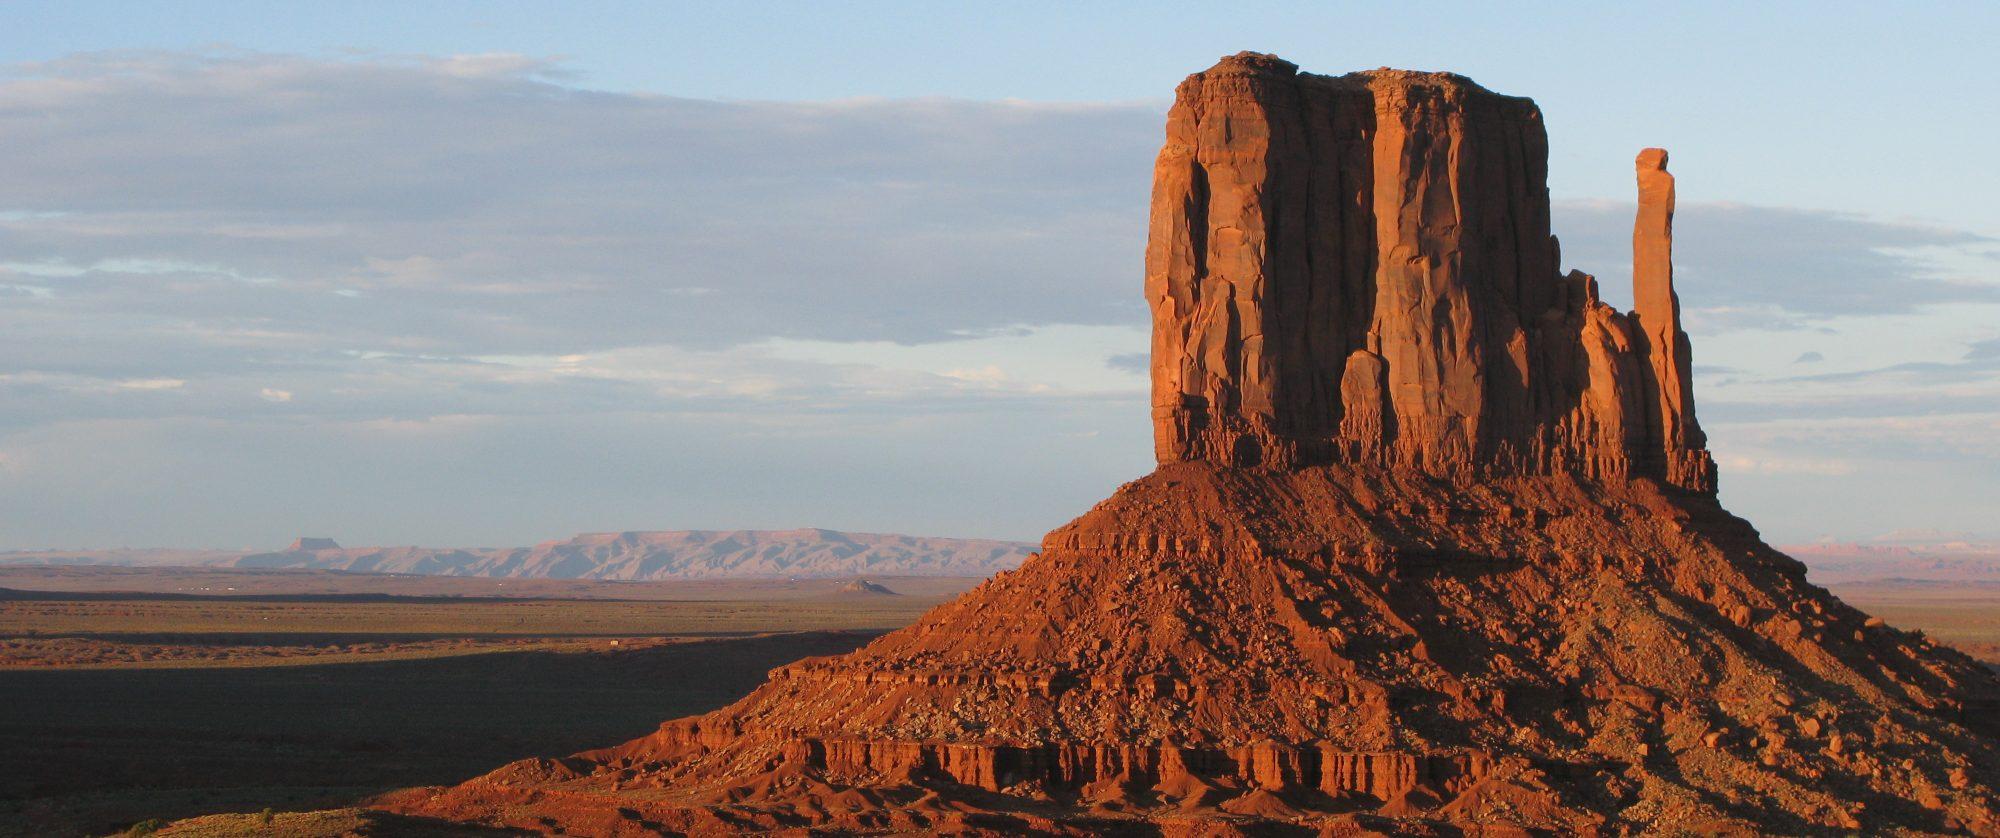 Geochronology and thermochronology University of Arizona